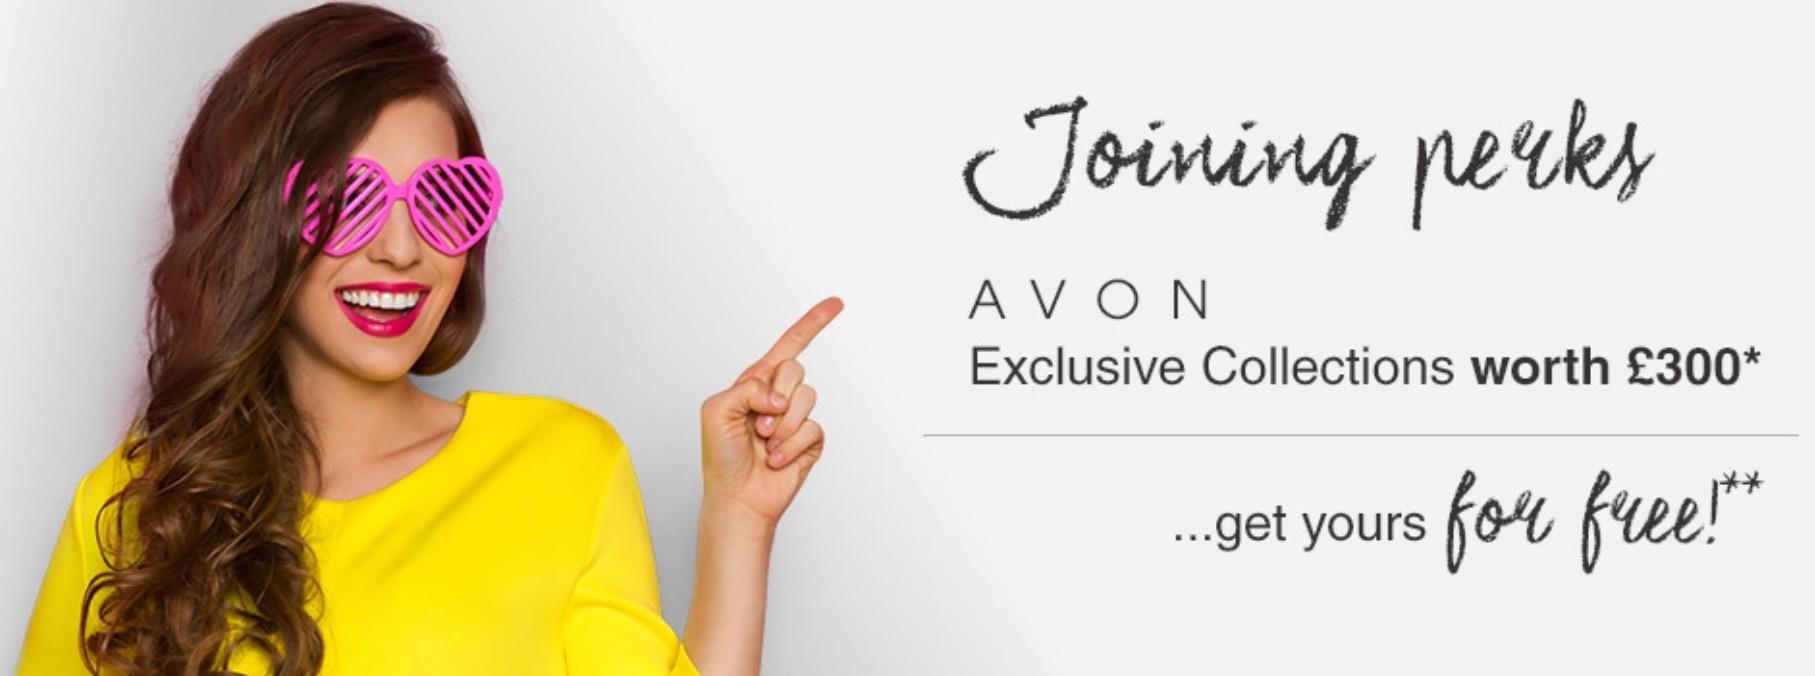 Avon £300 Product Pack for New Representatives | Join Avon